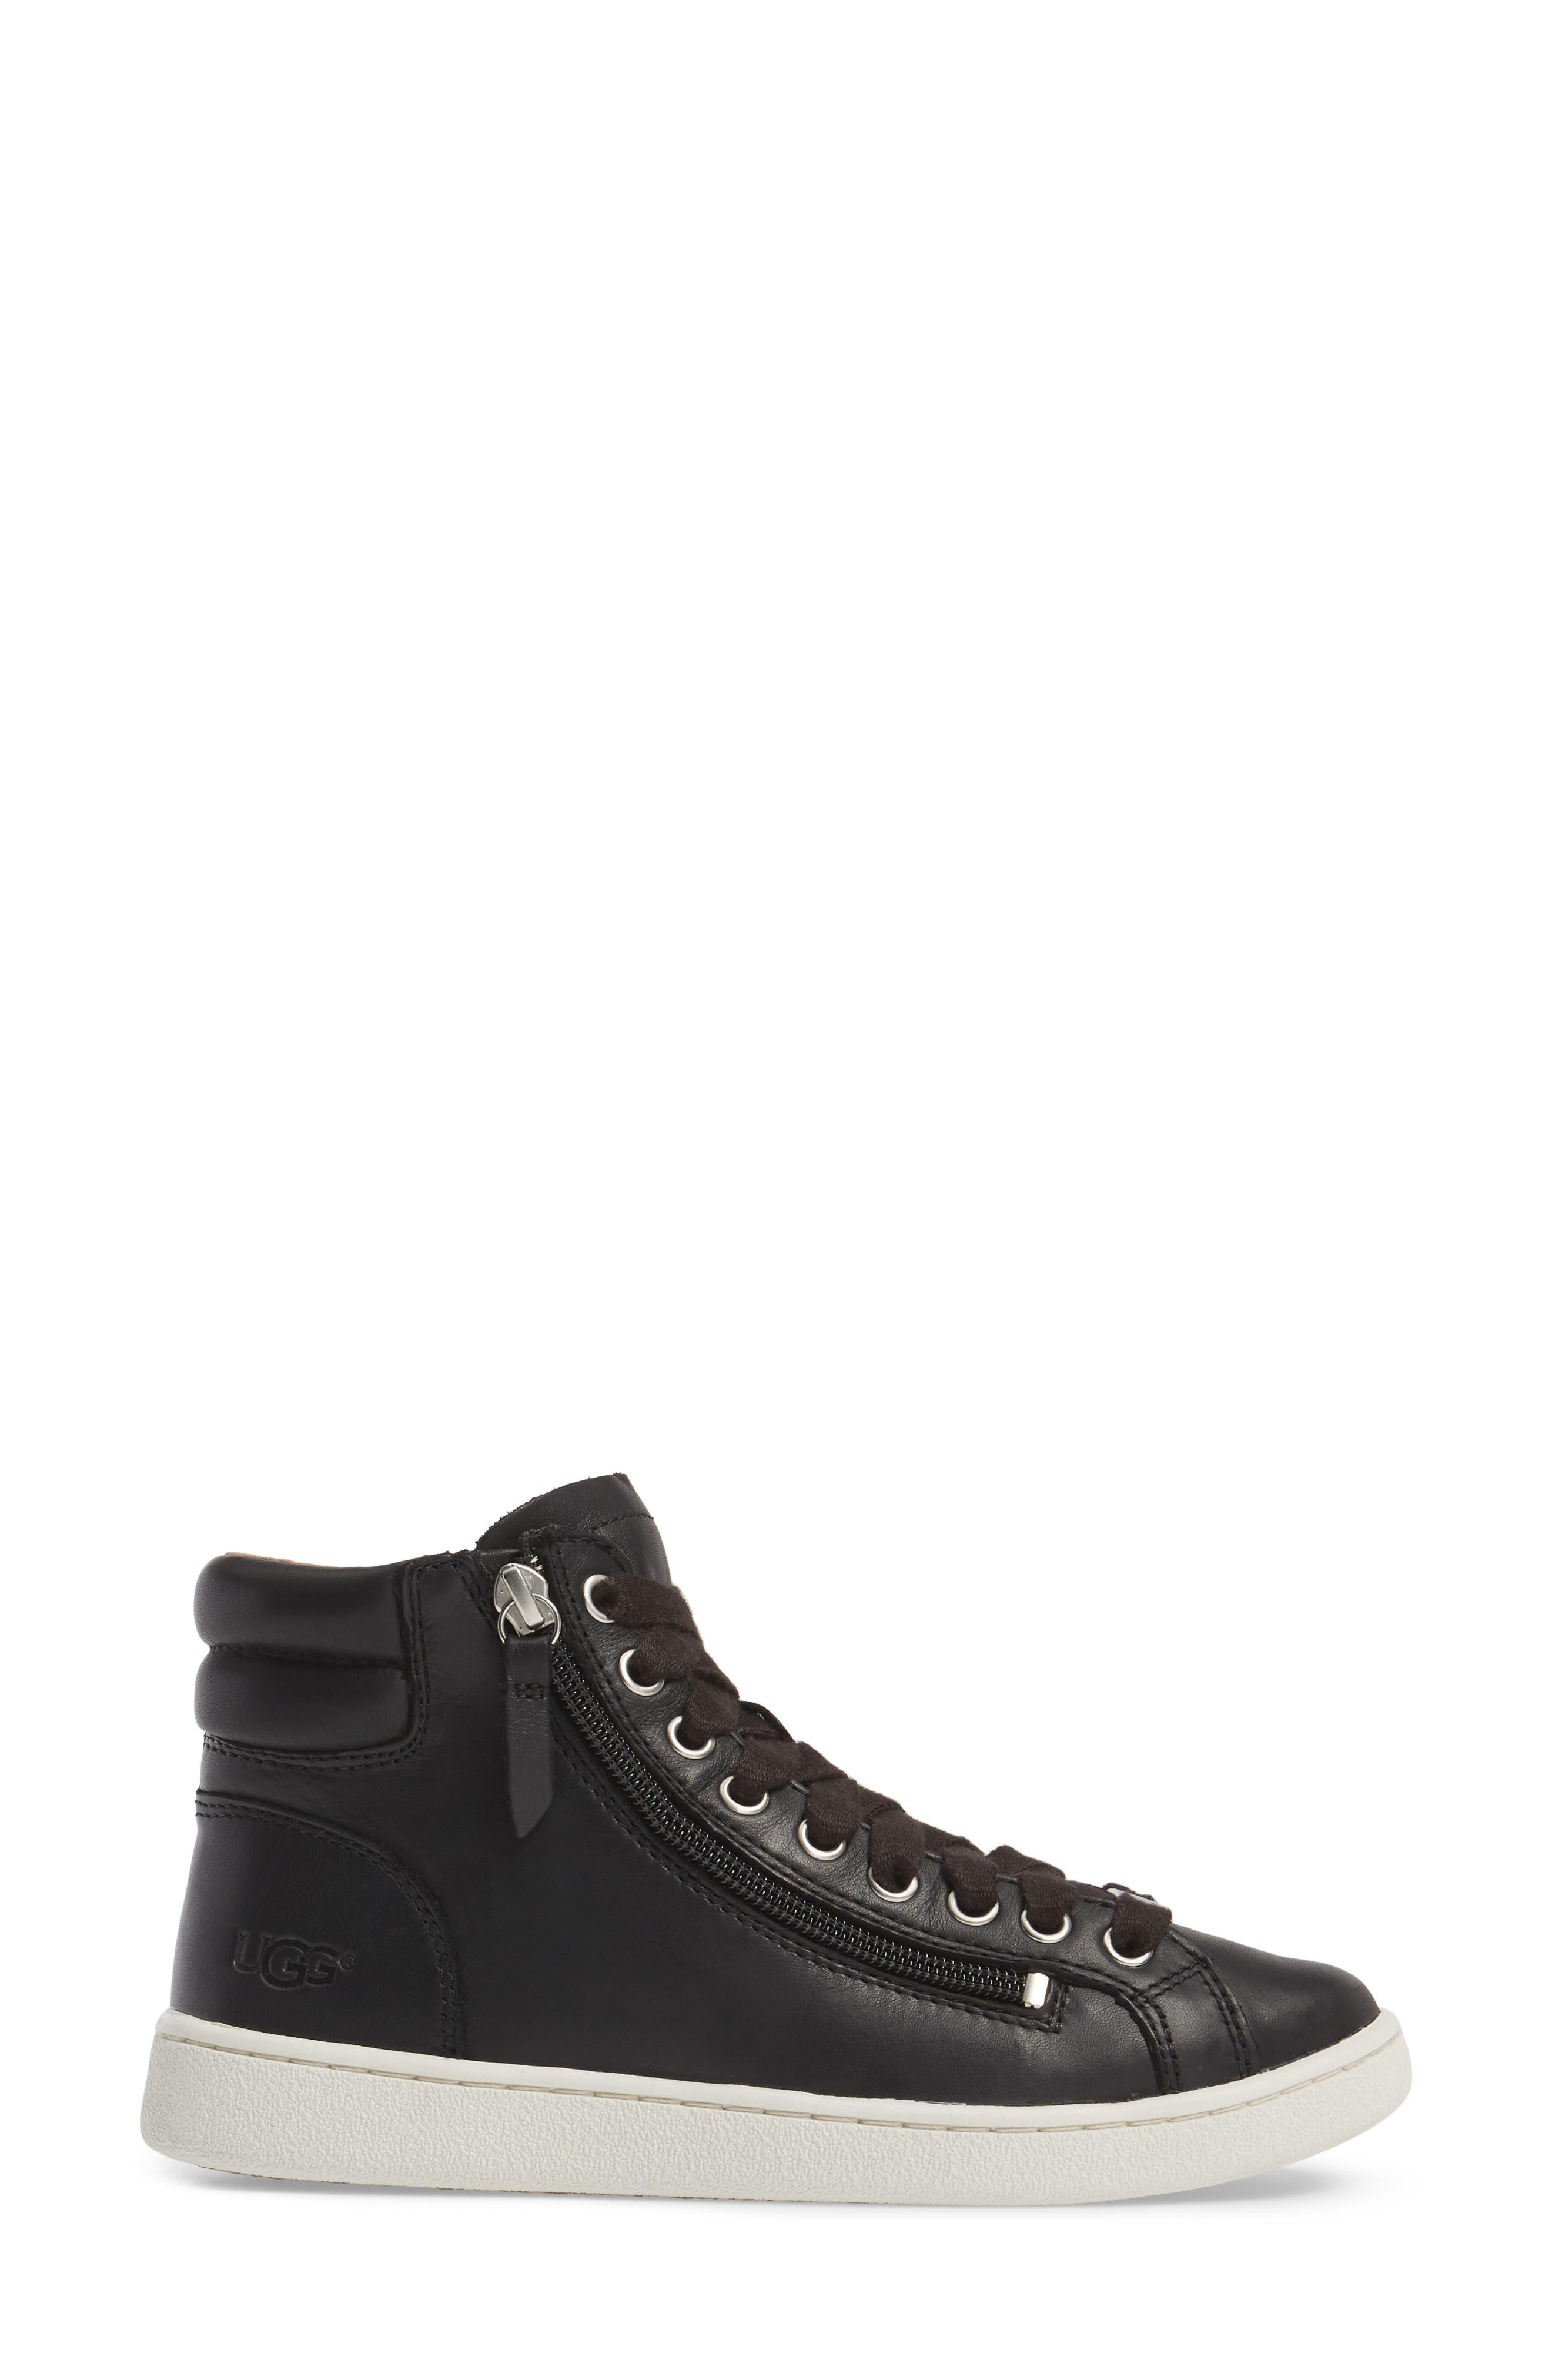 UGG<SUP>®</SUP>, UGG Olive High Top Sneaker, Alternate thumbnail 3, color, BLACK LEATHER